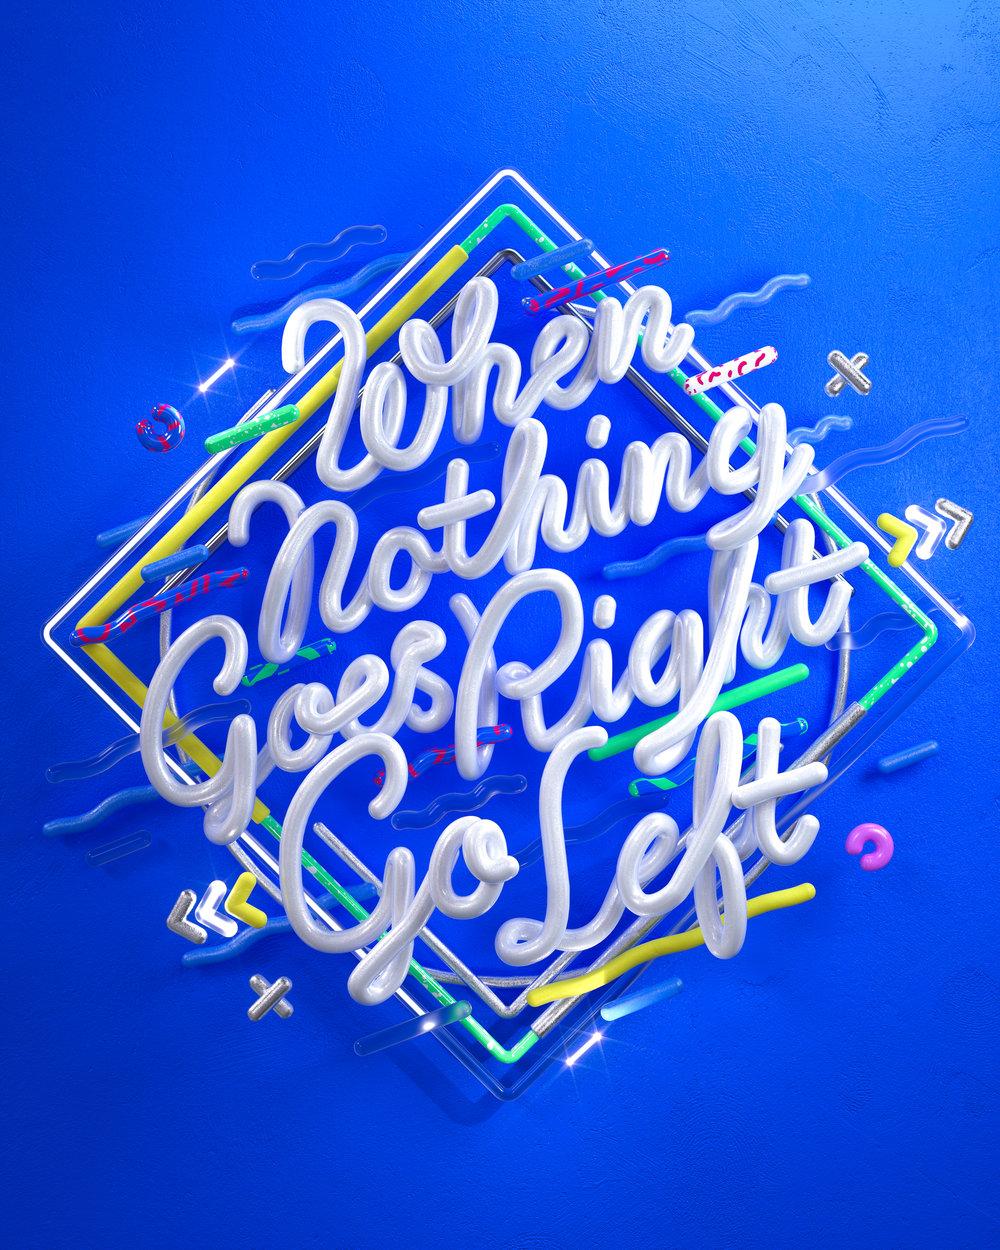 WhenNothingGoesRightGoLeft_Typography_HighRes.jpg